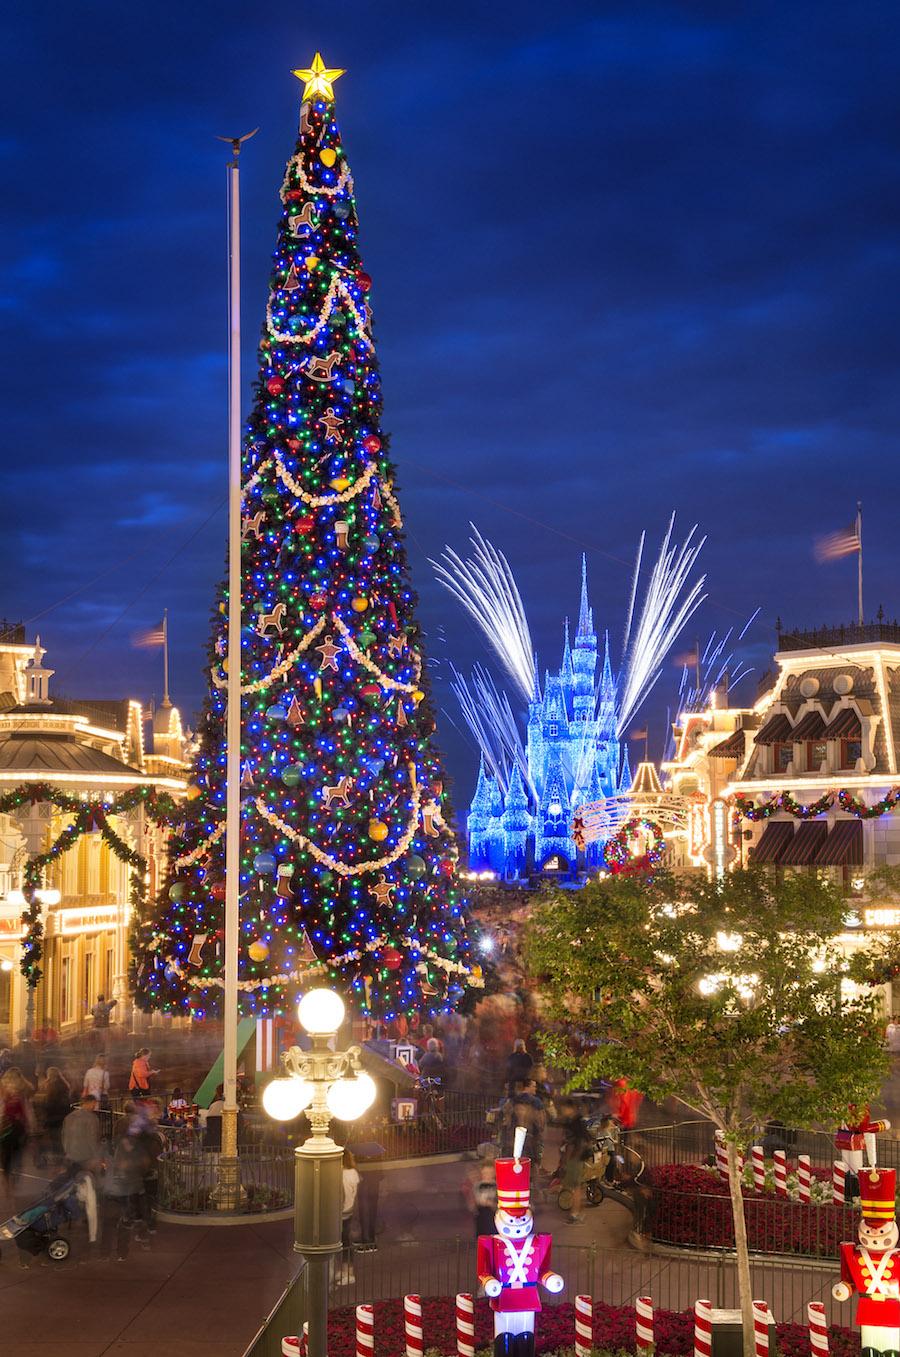 christmas tree at magic kingdom park - Disney Christmas Trees